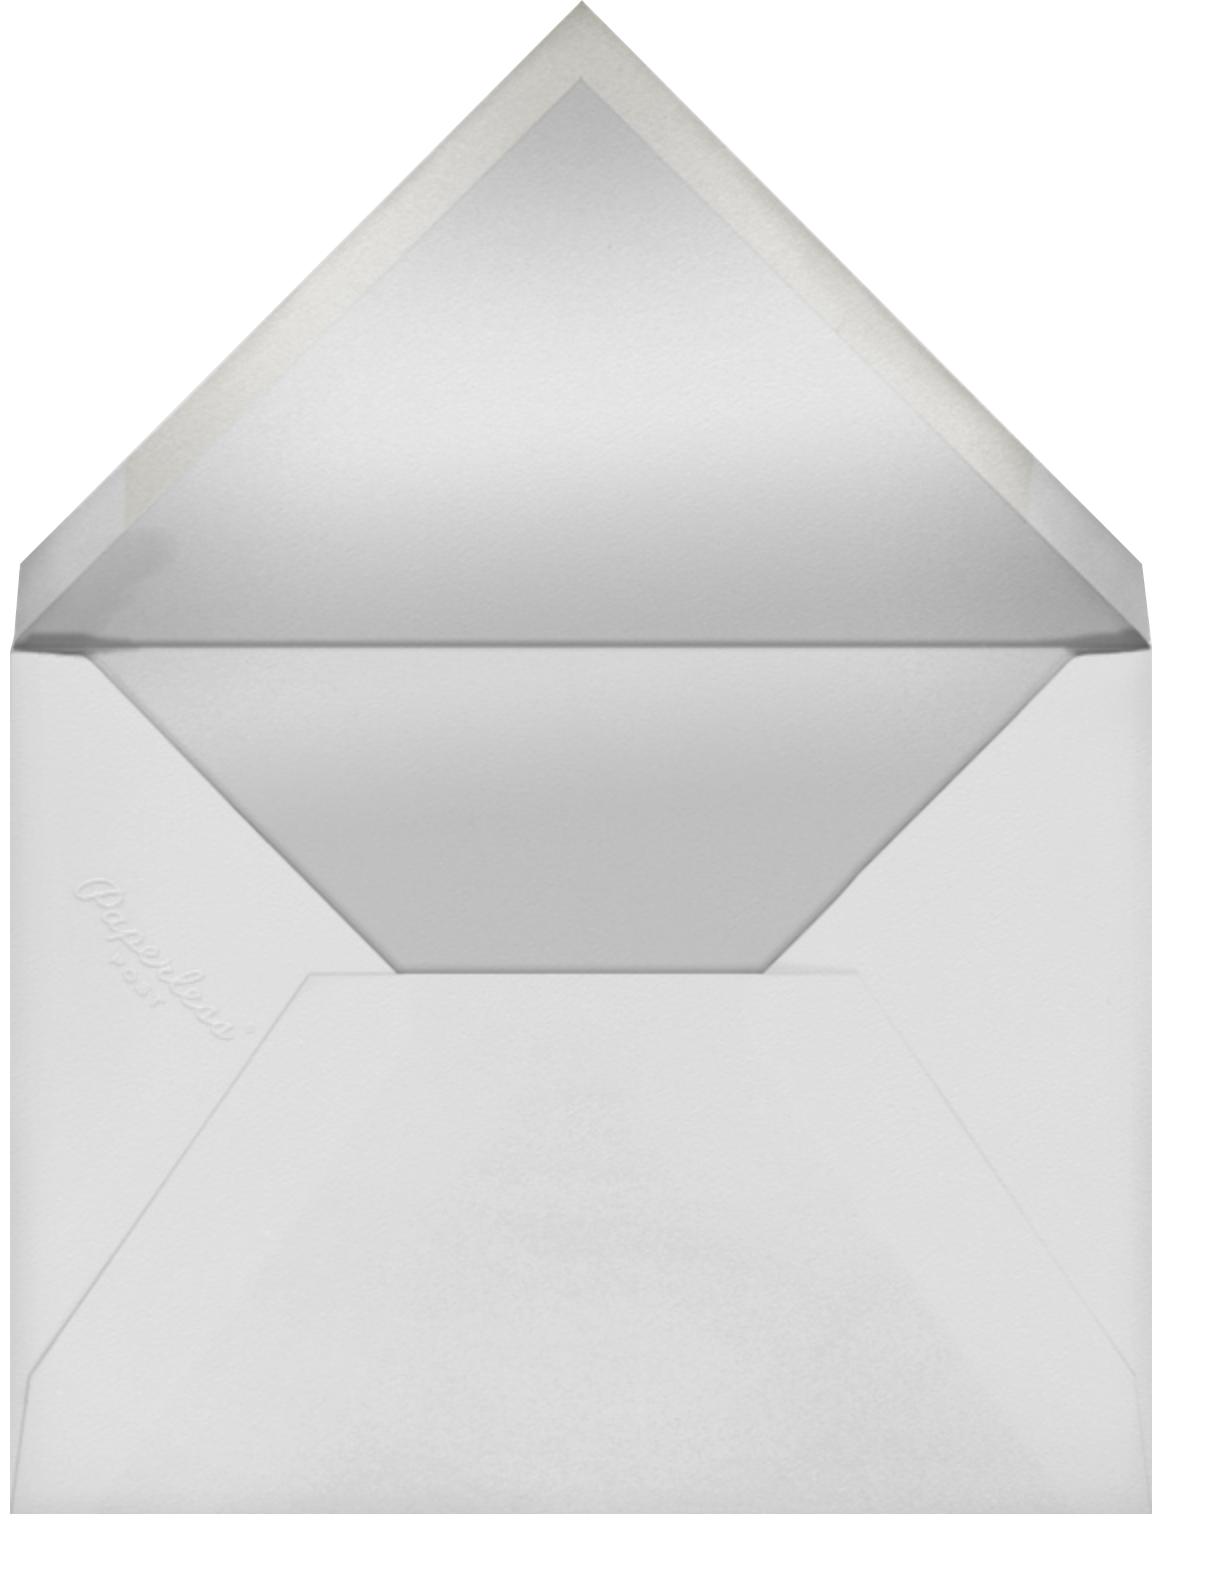 Lord Paisley Tana (Menu) - Liberty - Envelope